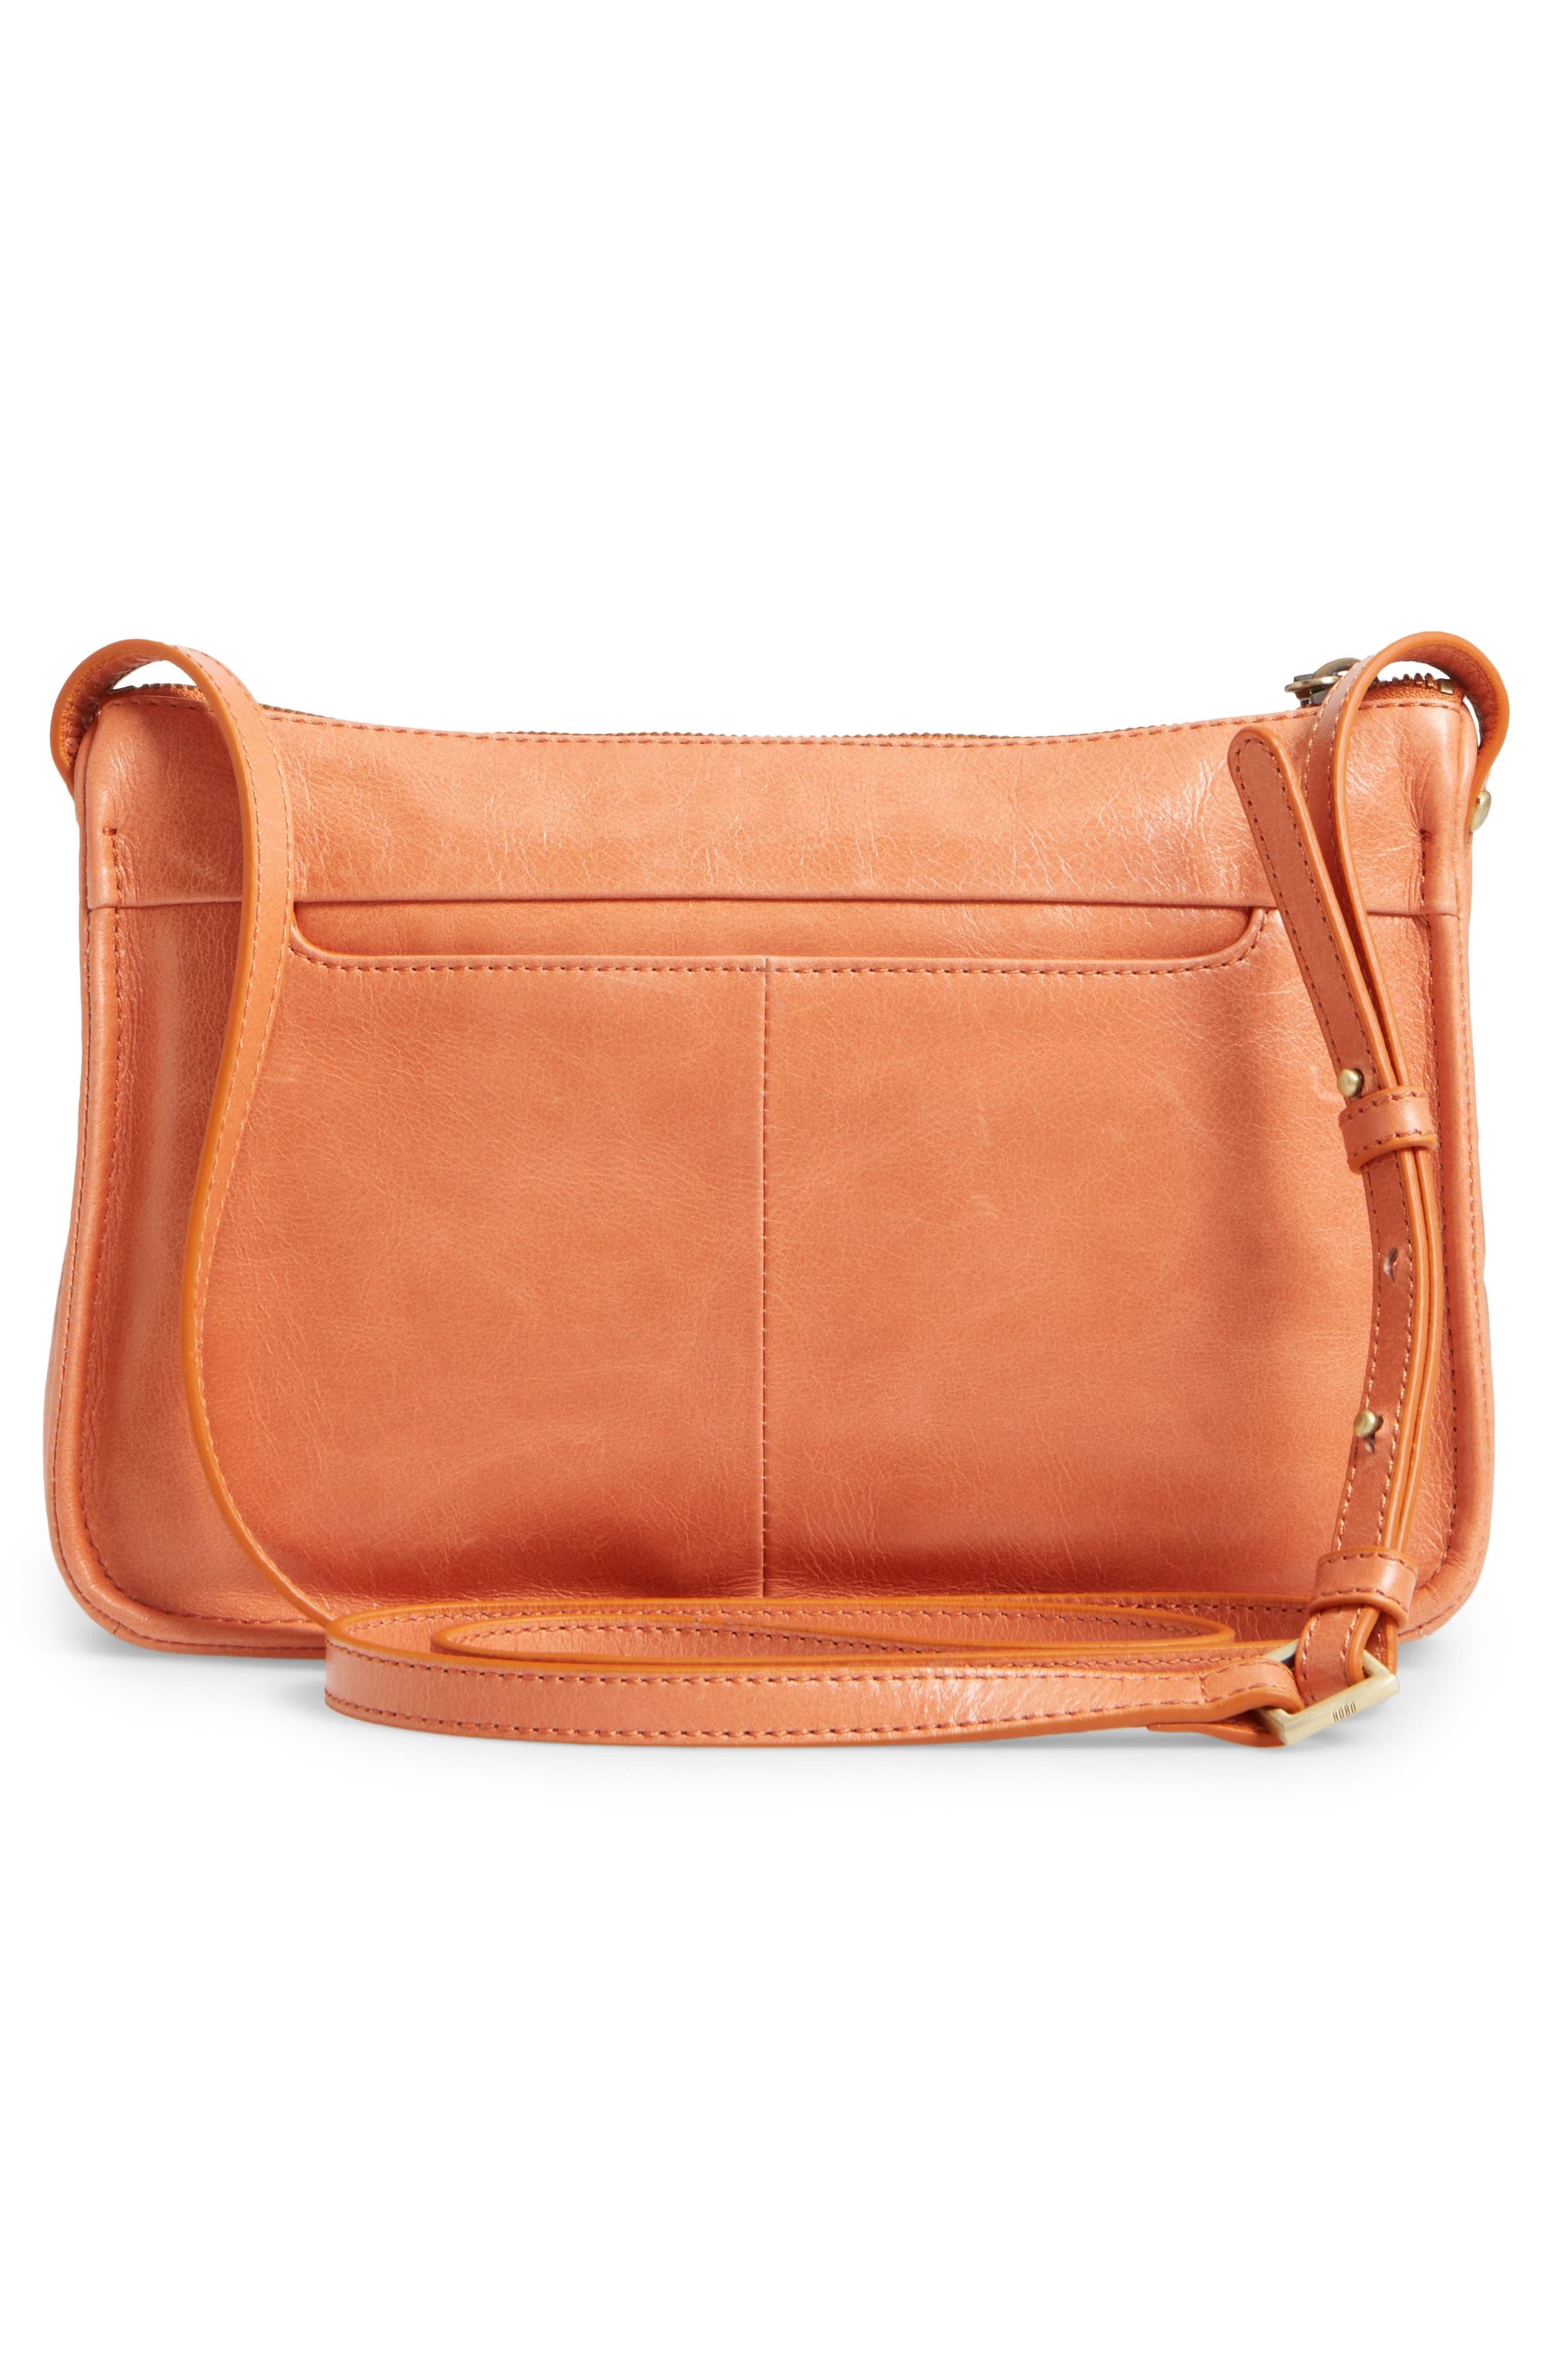 Alternate Image 2  - Hobo Mission Leather Crossbody Bag